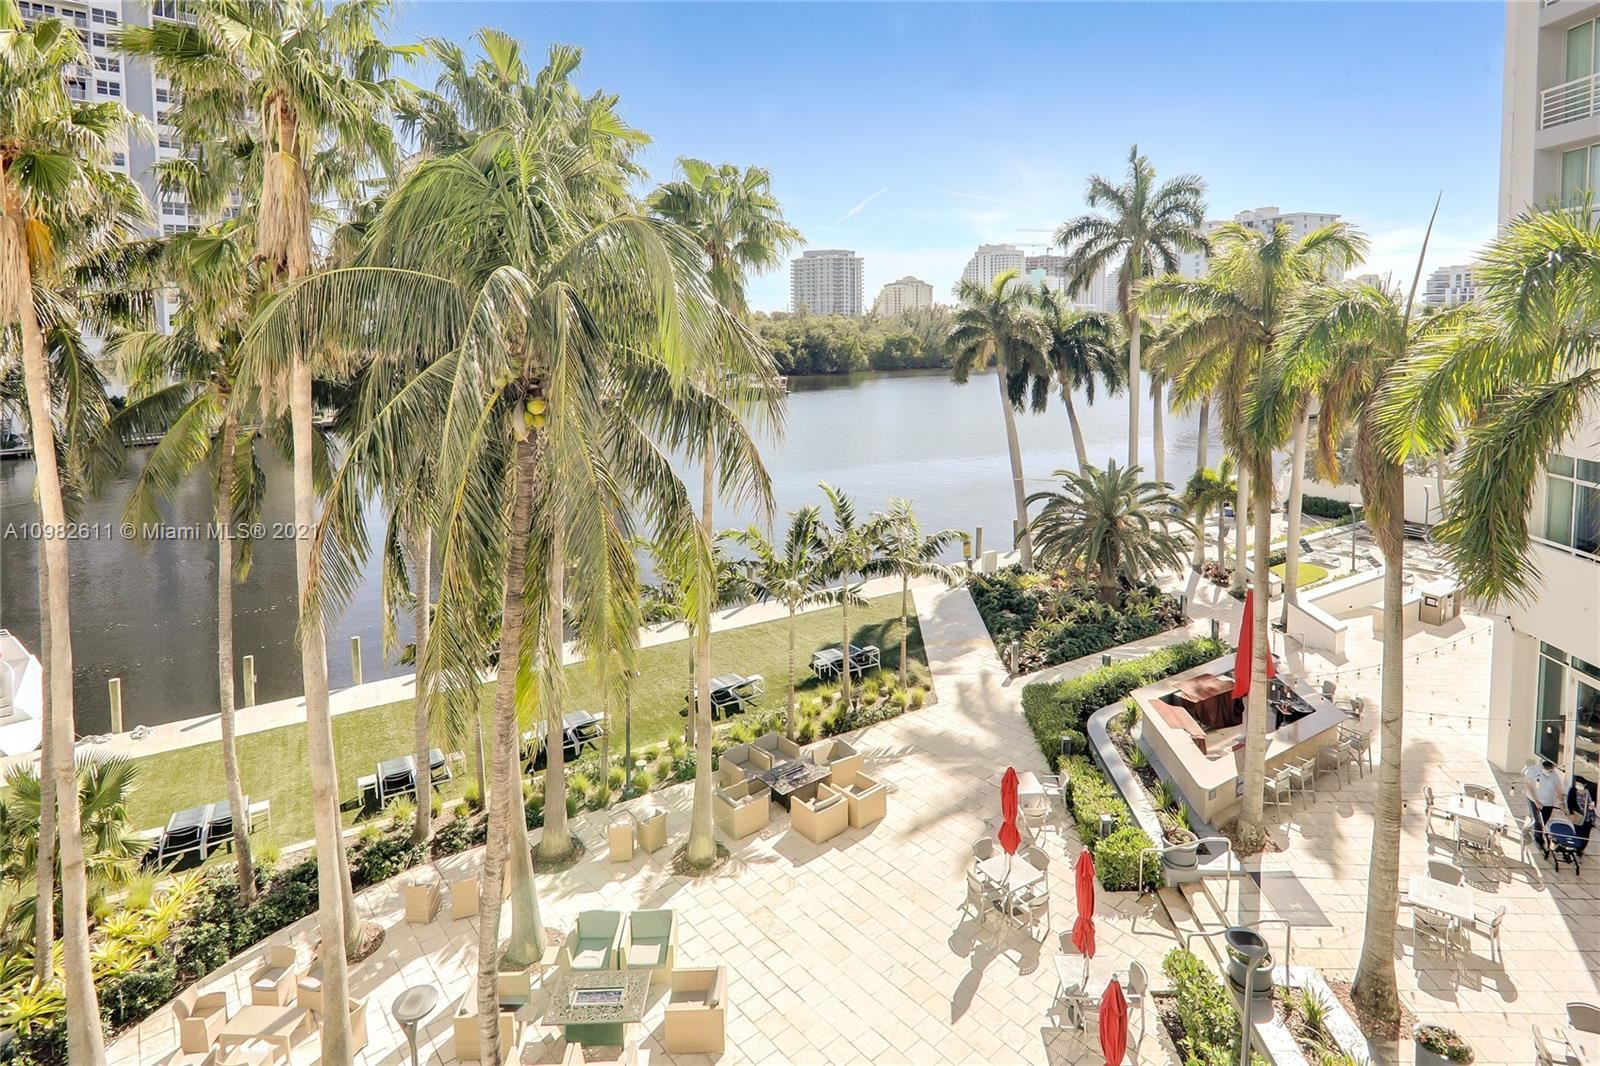 2670 E Sunrise Blvd #322, Fort Lauderdale, FL 33304 - #: A10982611